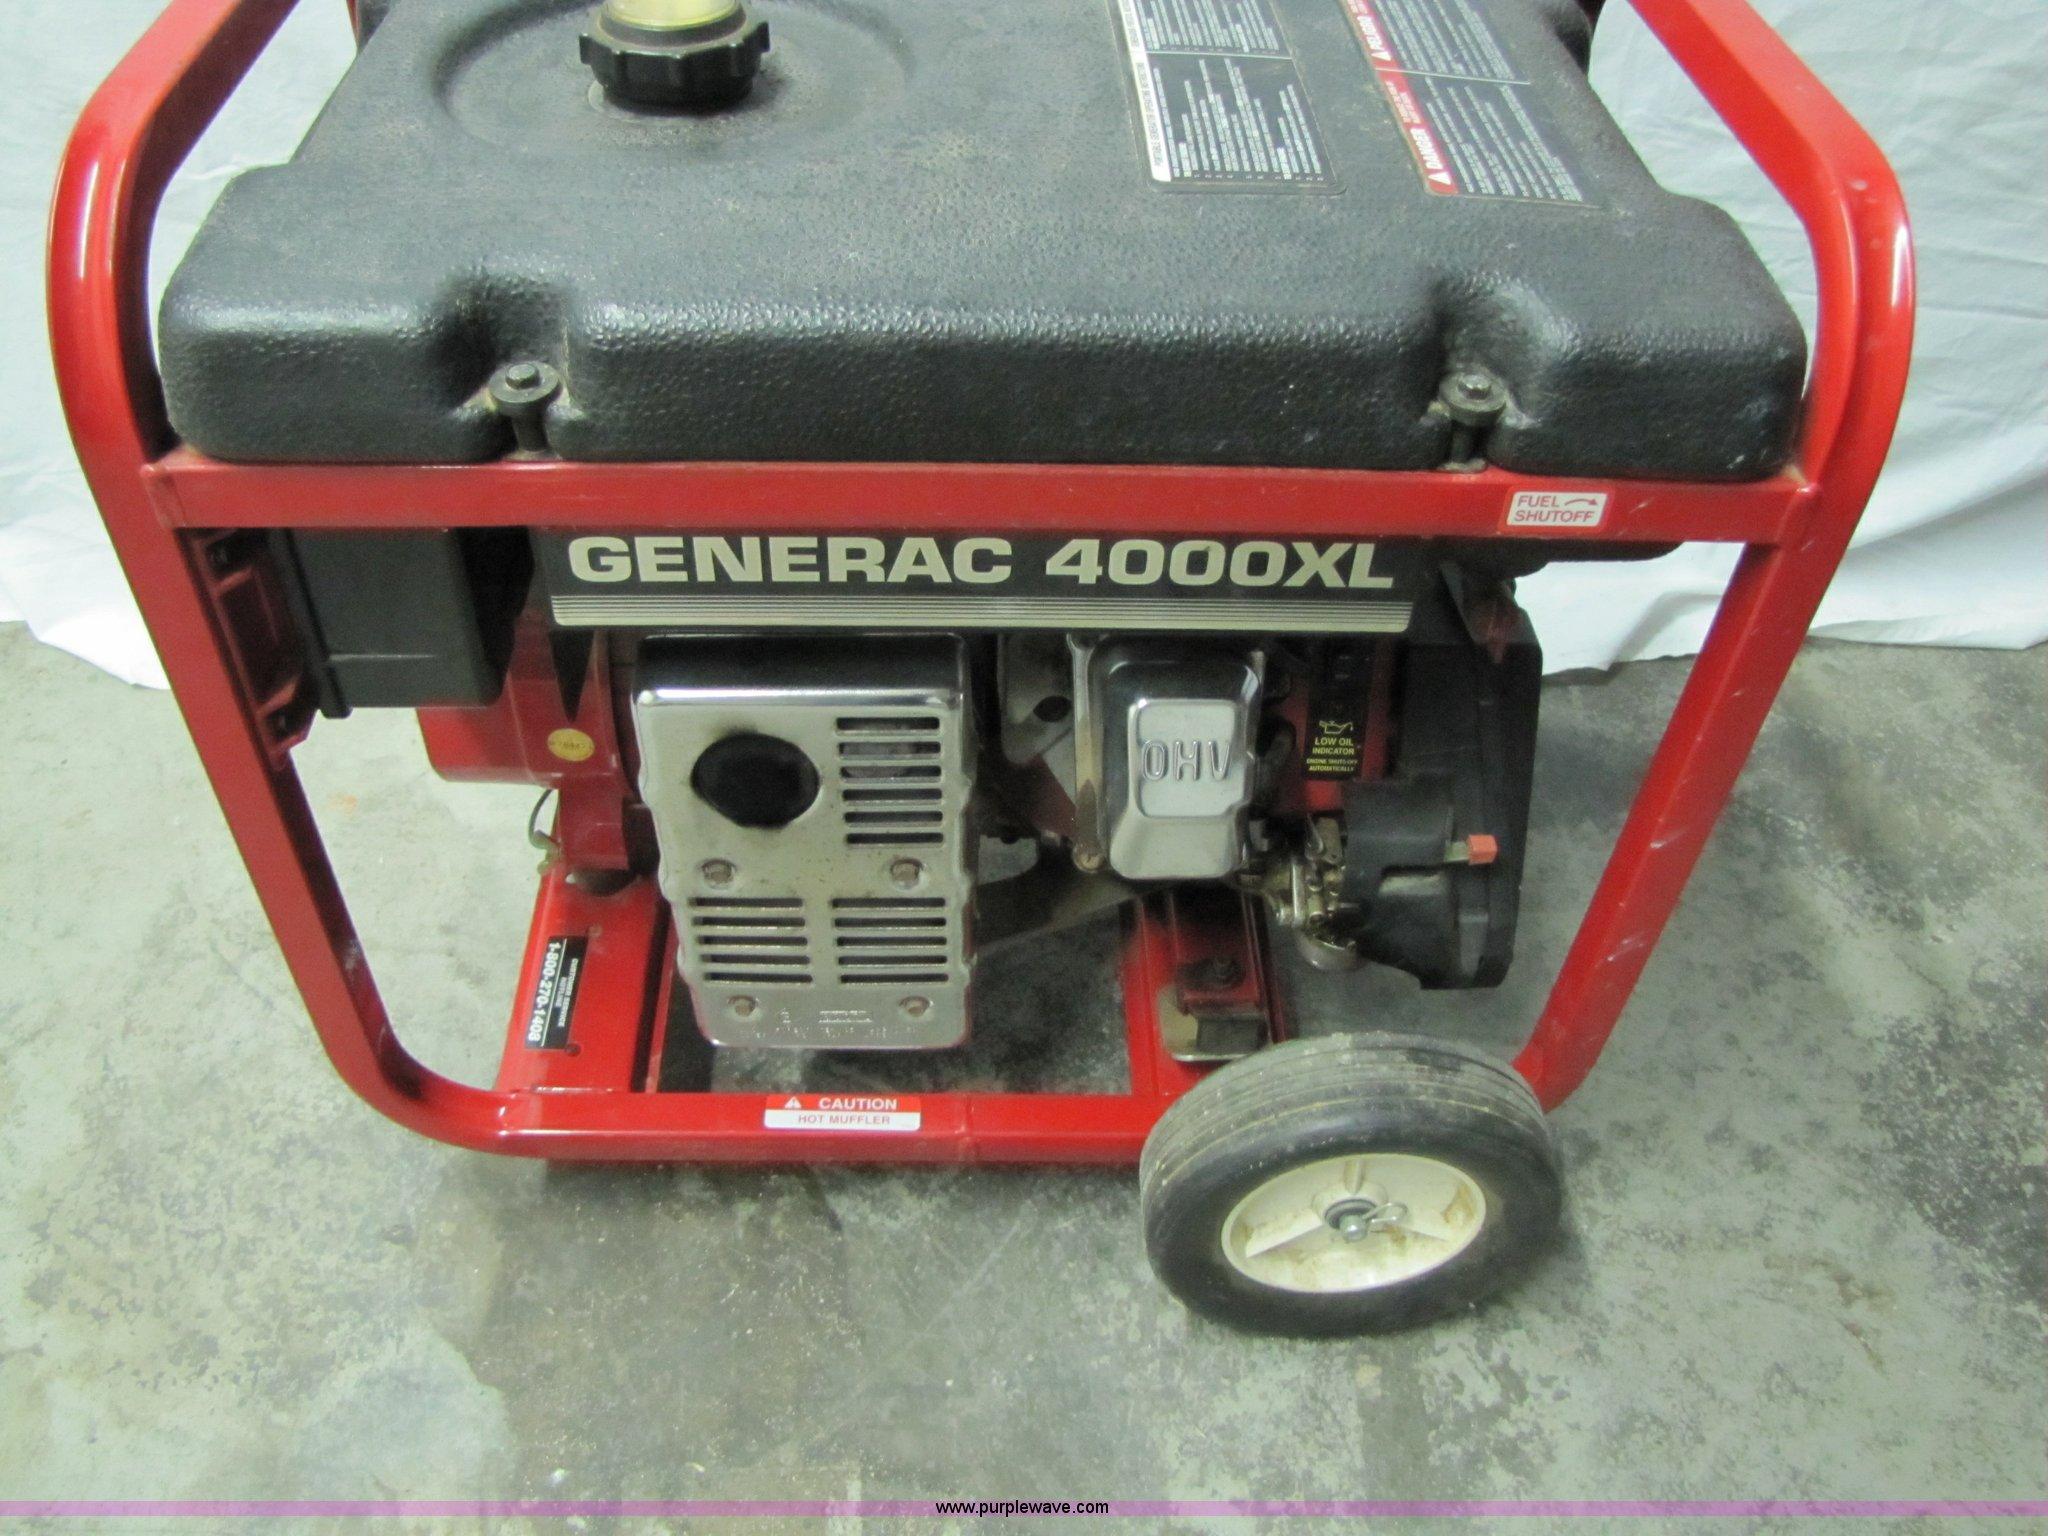 Generac 4000XL Generator | Item 2002 | SOLD! November 16 Nev